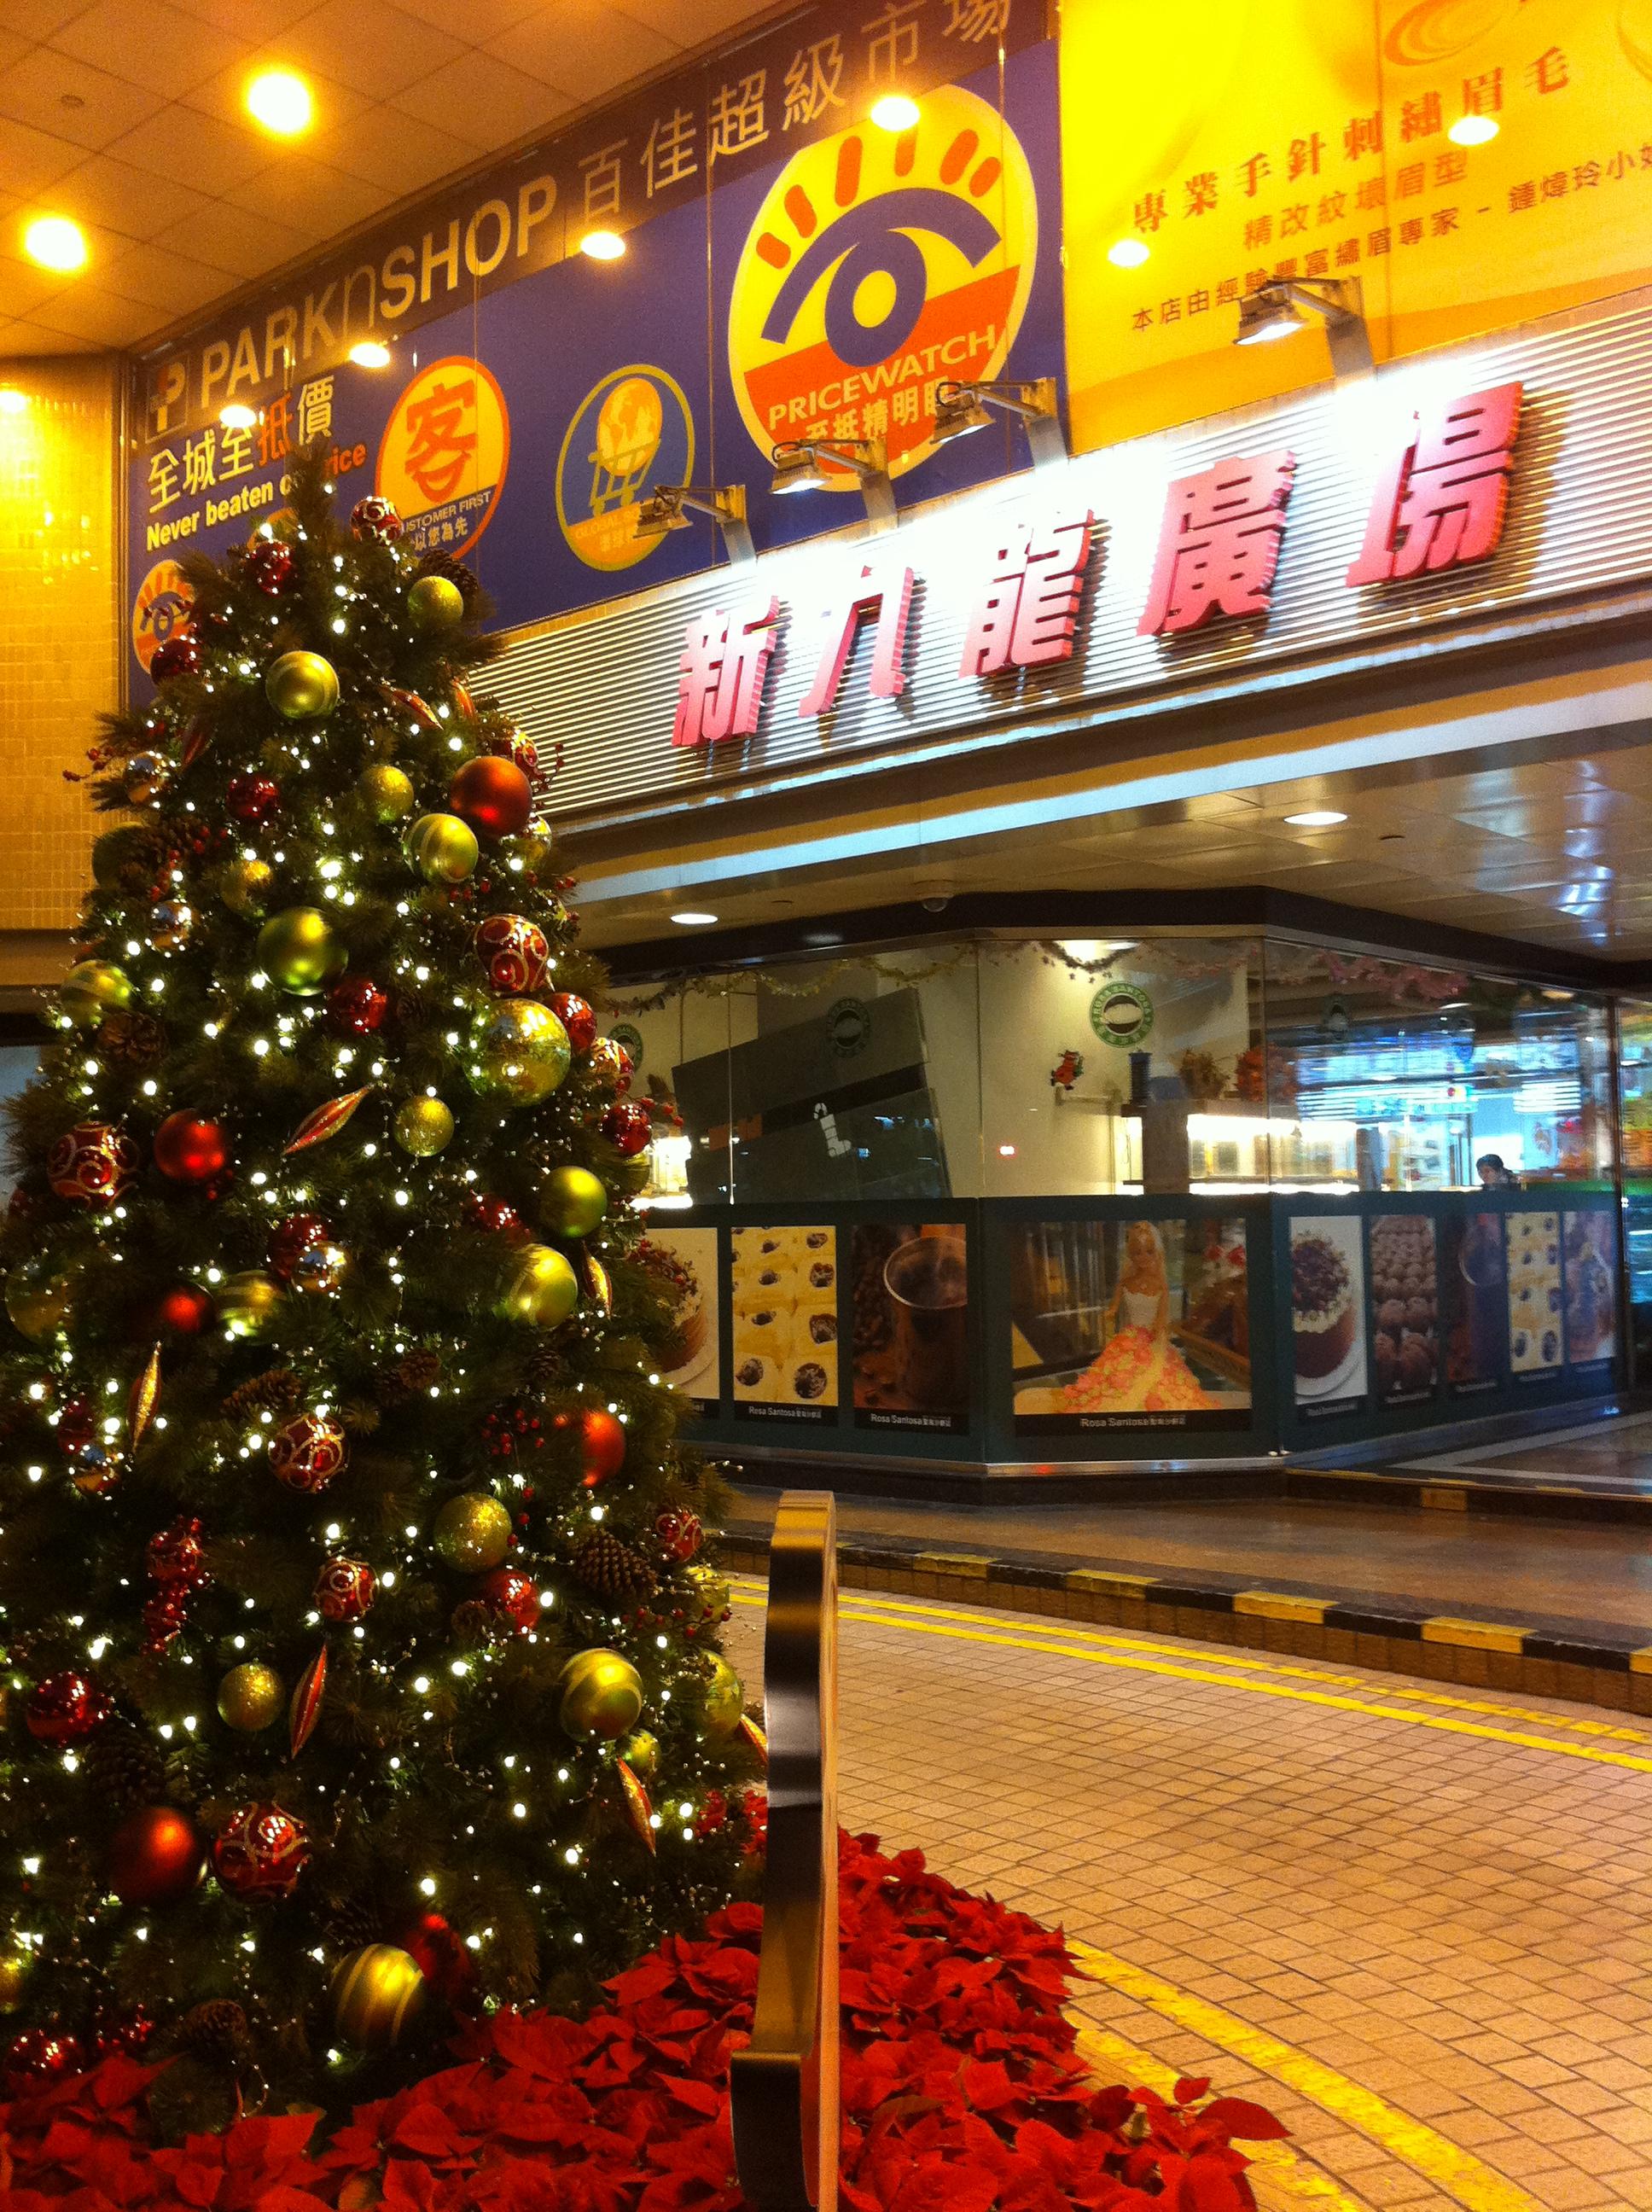 File:HK Tai Kok Tsui evening 新九龍廣場 New Kowloon Plaza Cherry Street Xmas tree n Chinese name sign Dec-2012.JPG - Wikimedia Commons